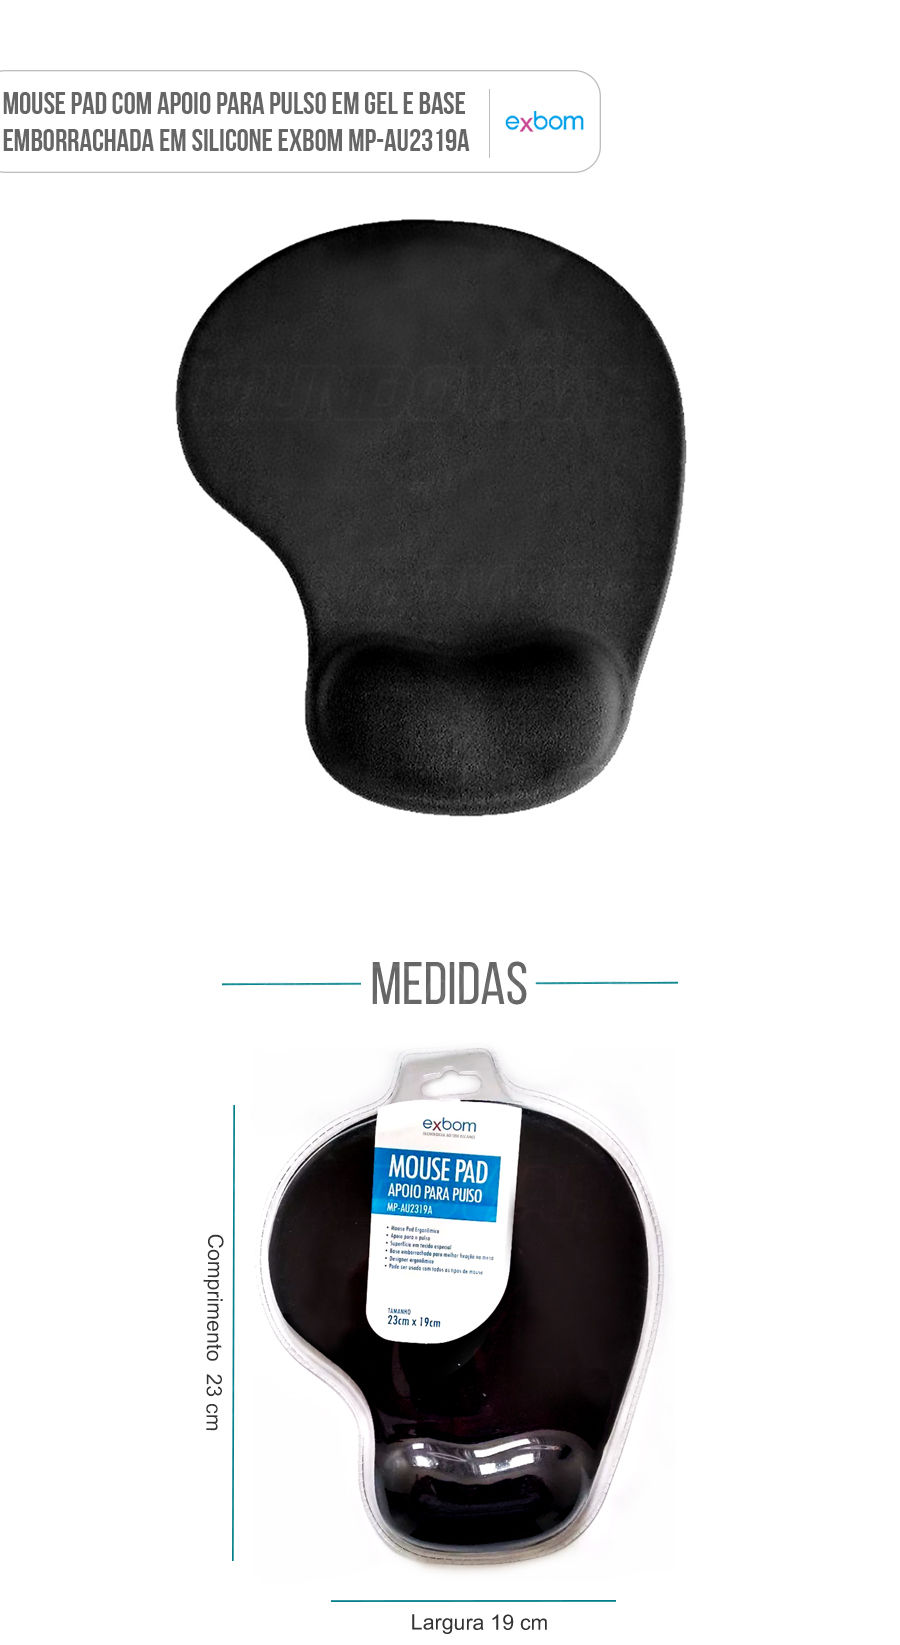 Mouse Pad apoio para pulso em gel silicone cor preta